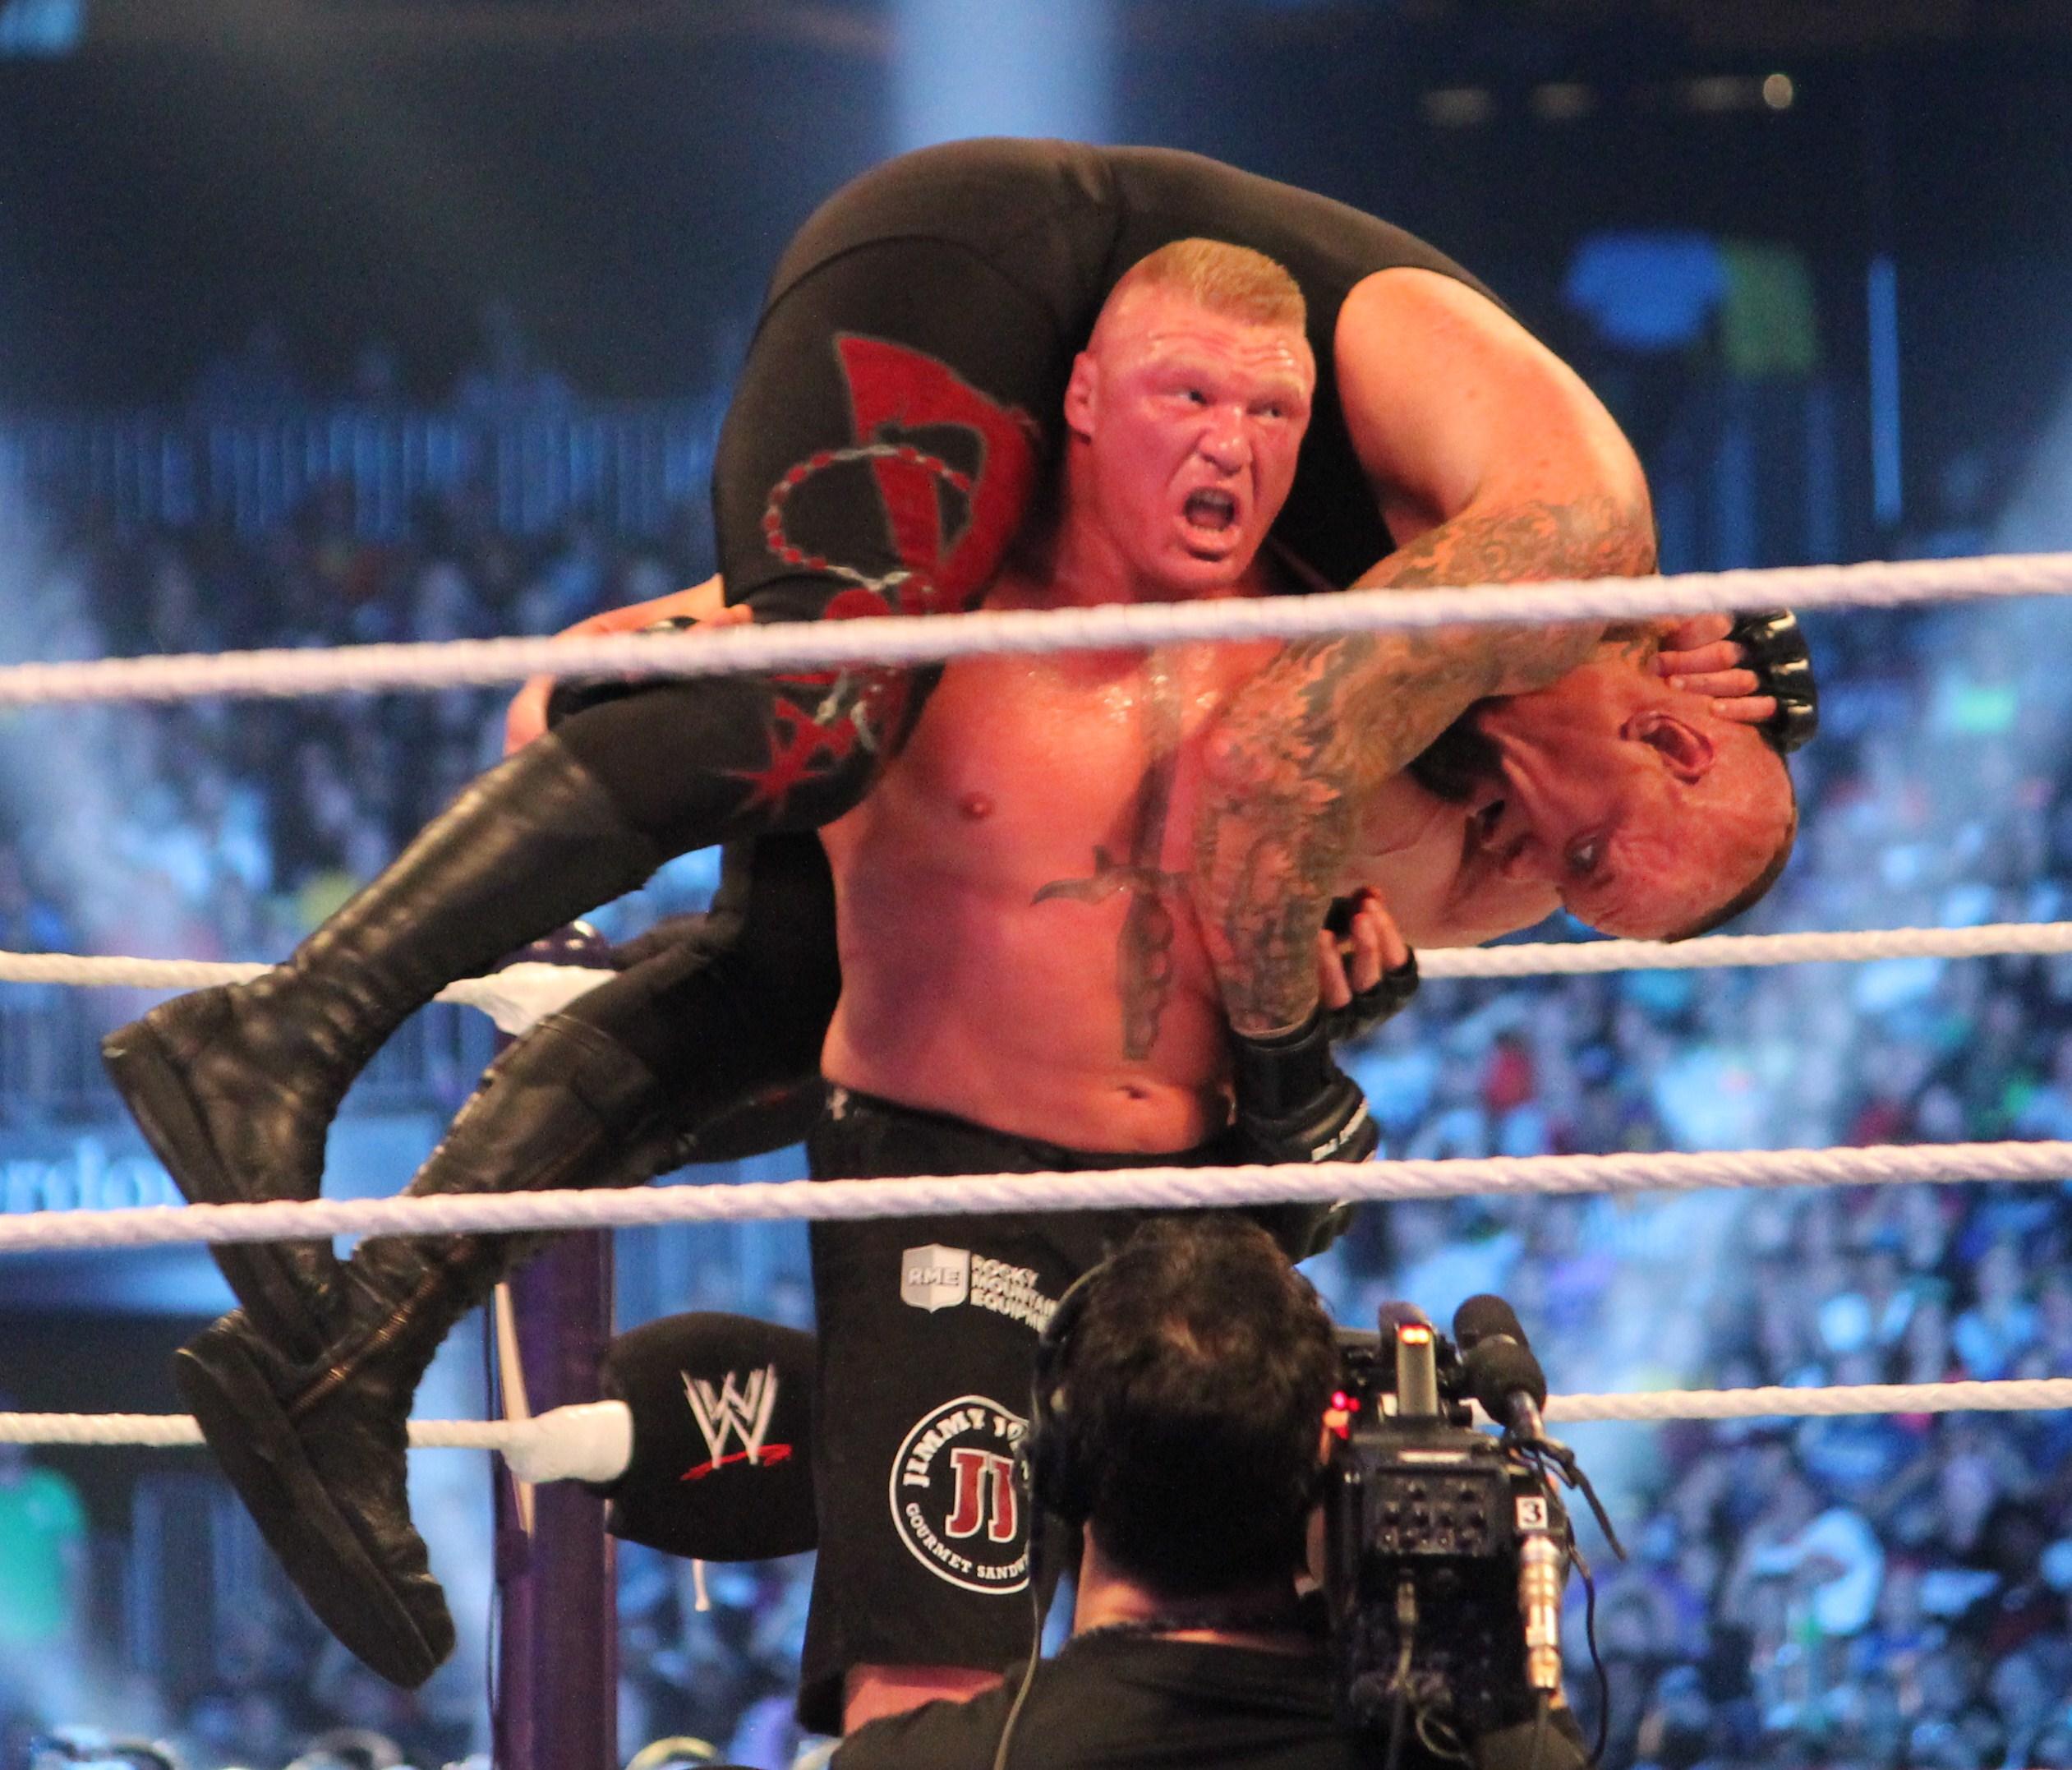 The Undertaker vs Brock Lesnar Wrestlemania 30